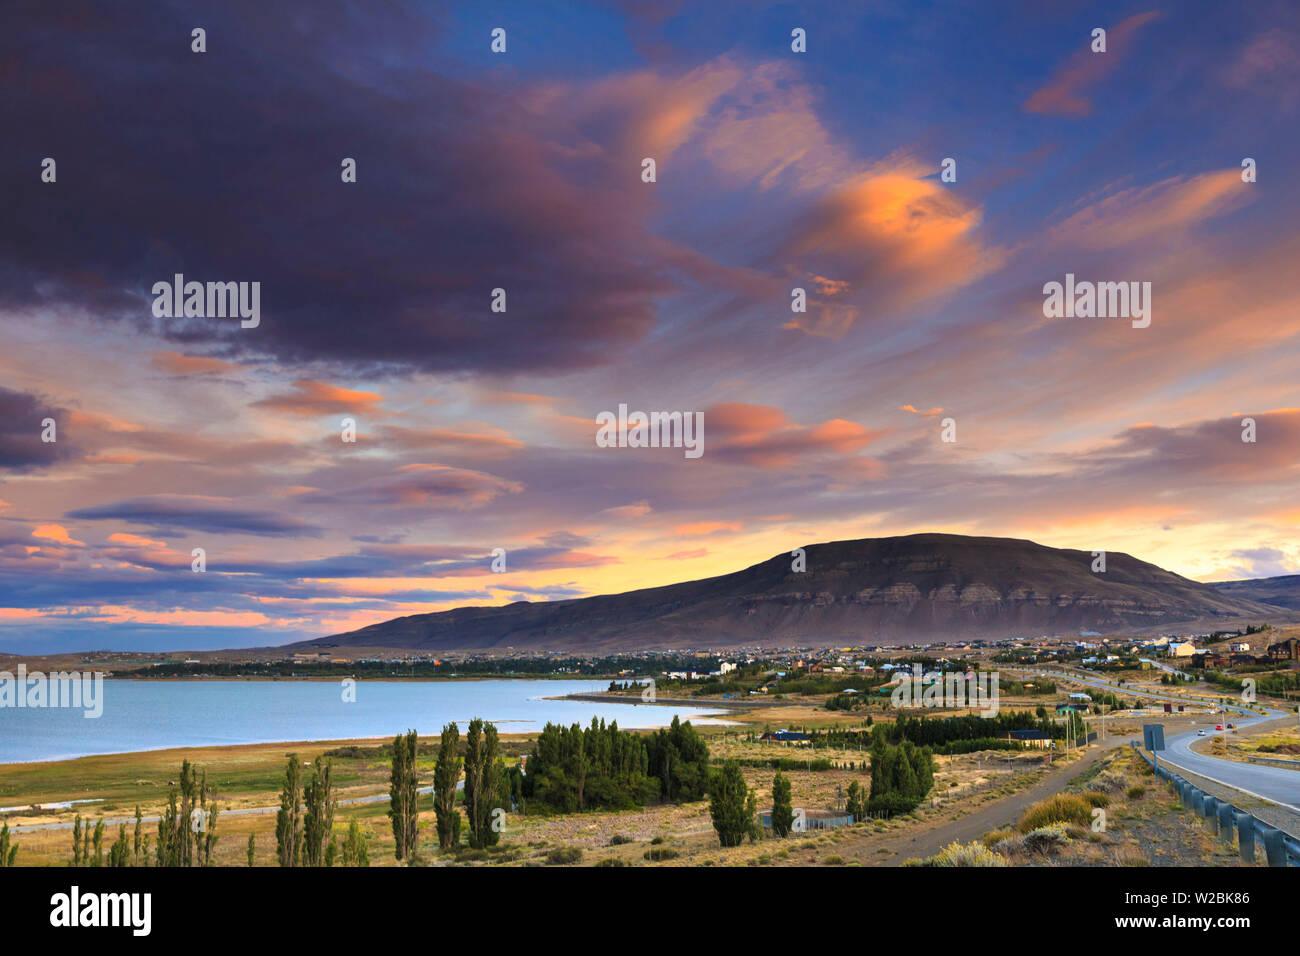 Argentina, Patagonia, El Calafate, Lago Argentino and El Calafate Town - Stock Image